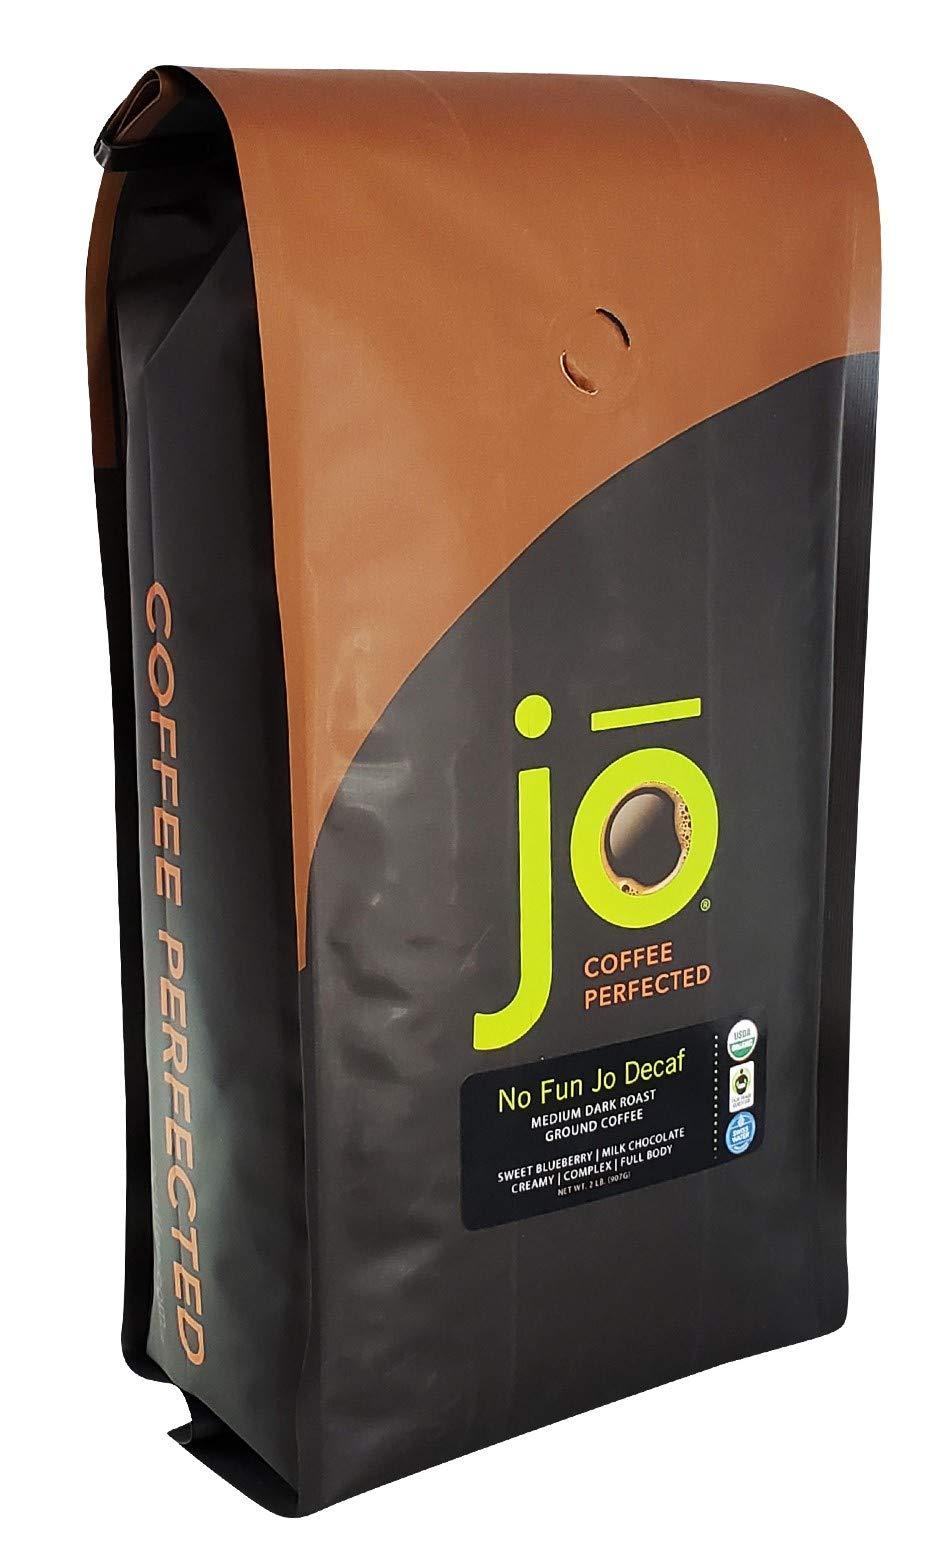 NO FUN JO DECAF: 2 lb, Organic Decaf Ground Coffee, Swiss Water Process, Fair Trade Certified, Medium Dark Roast, USDA Certified Organic, NON-GMO, Chemical Free, Gluten Free Arabica Coffee by Jo Coffee